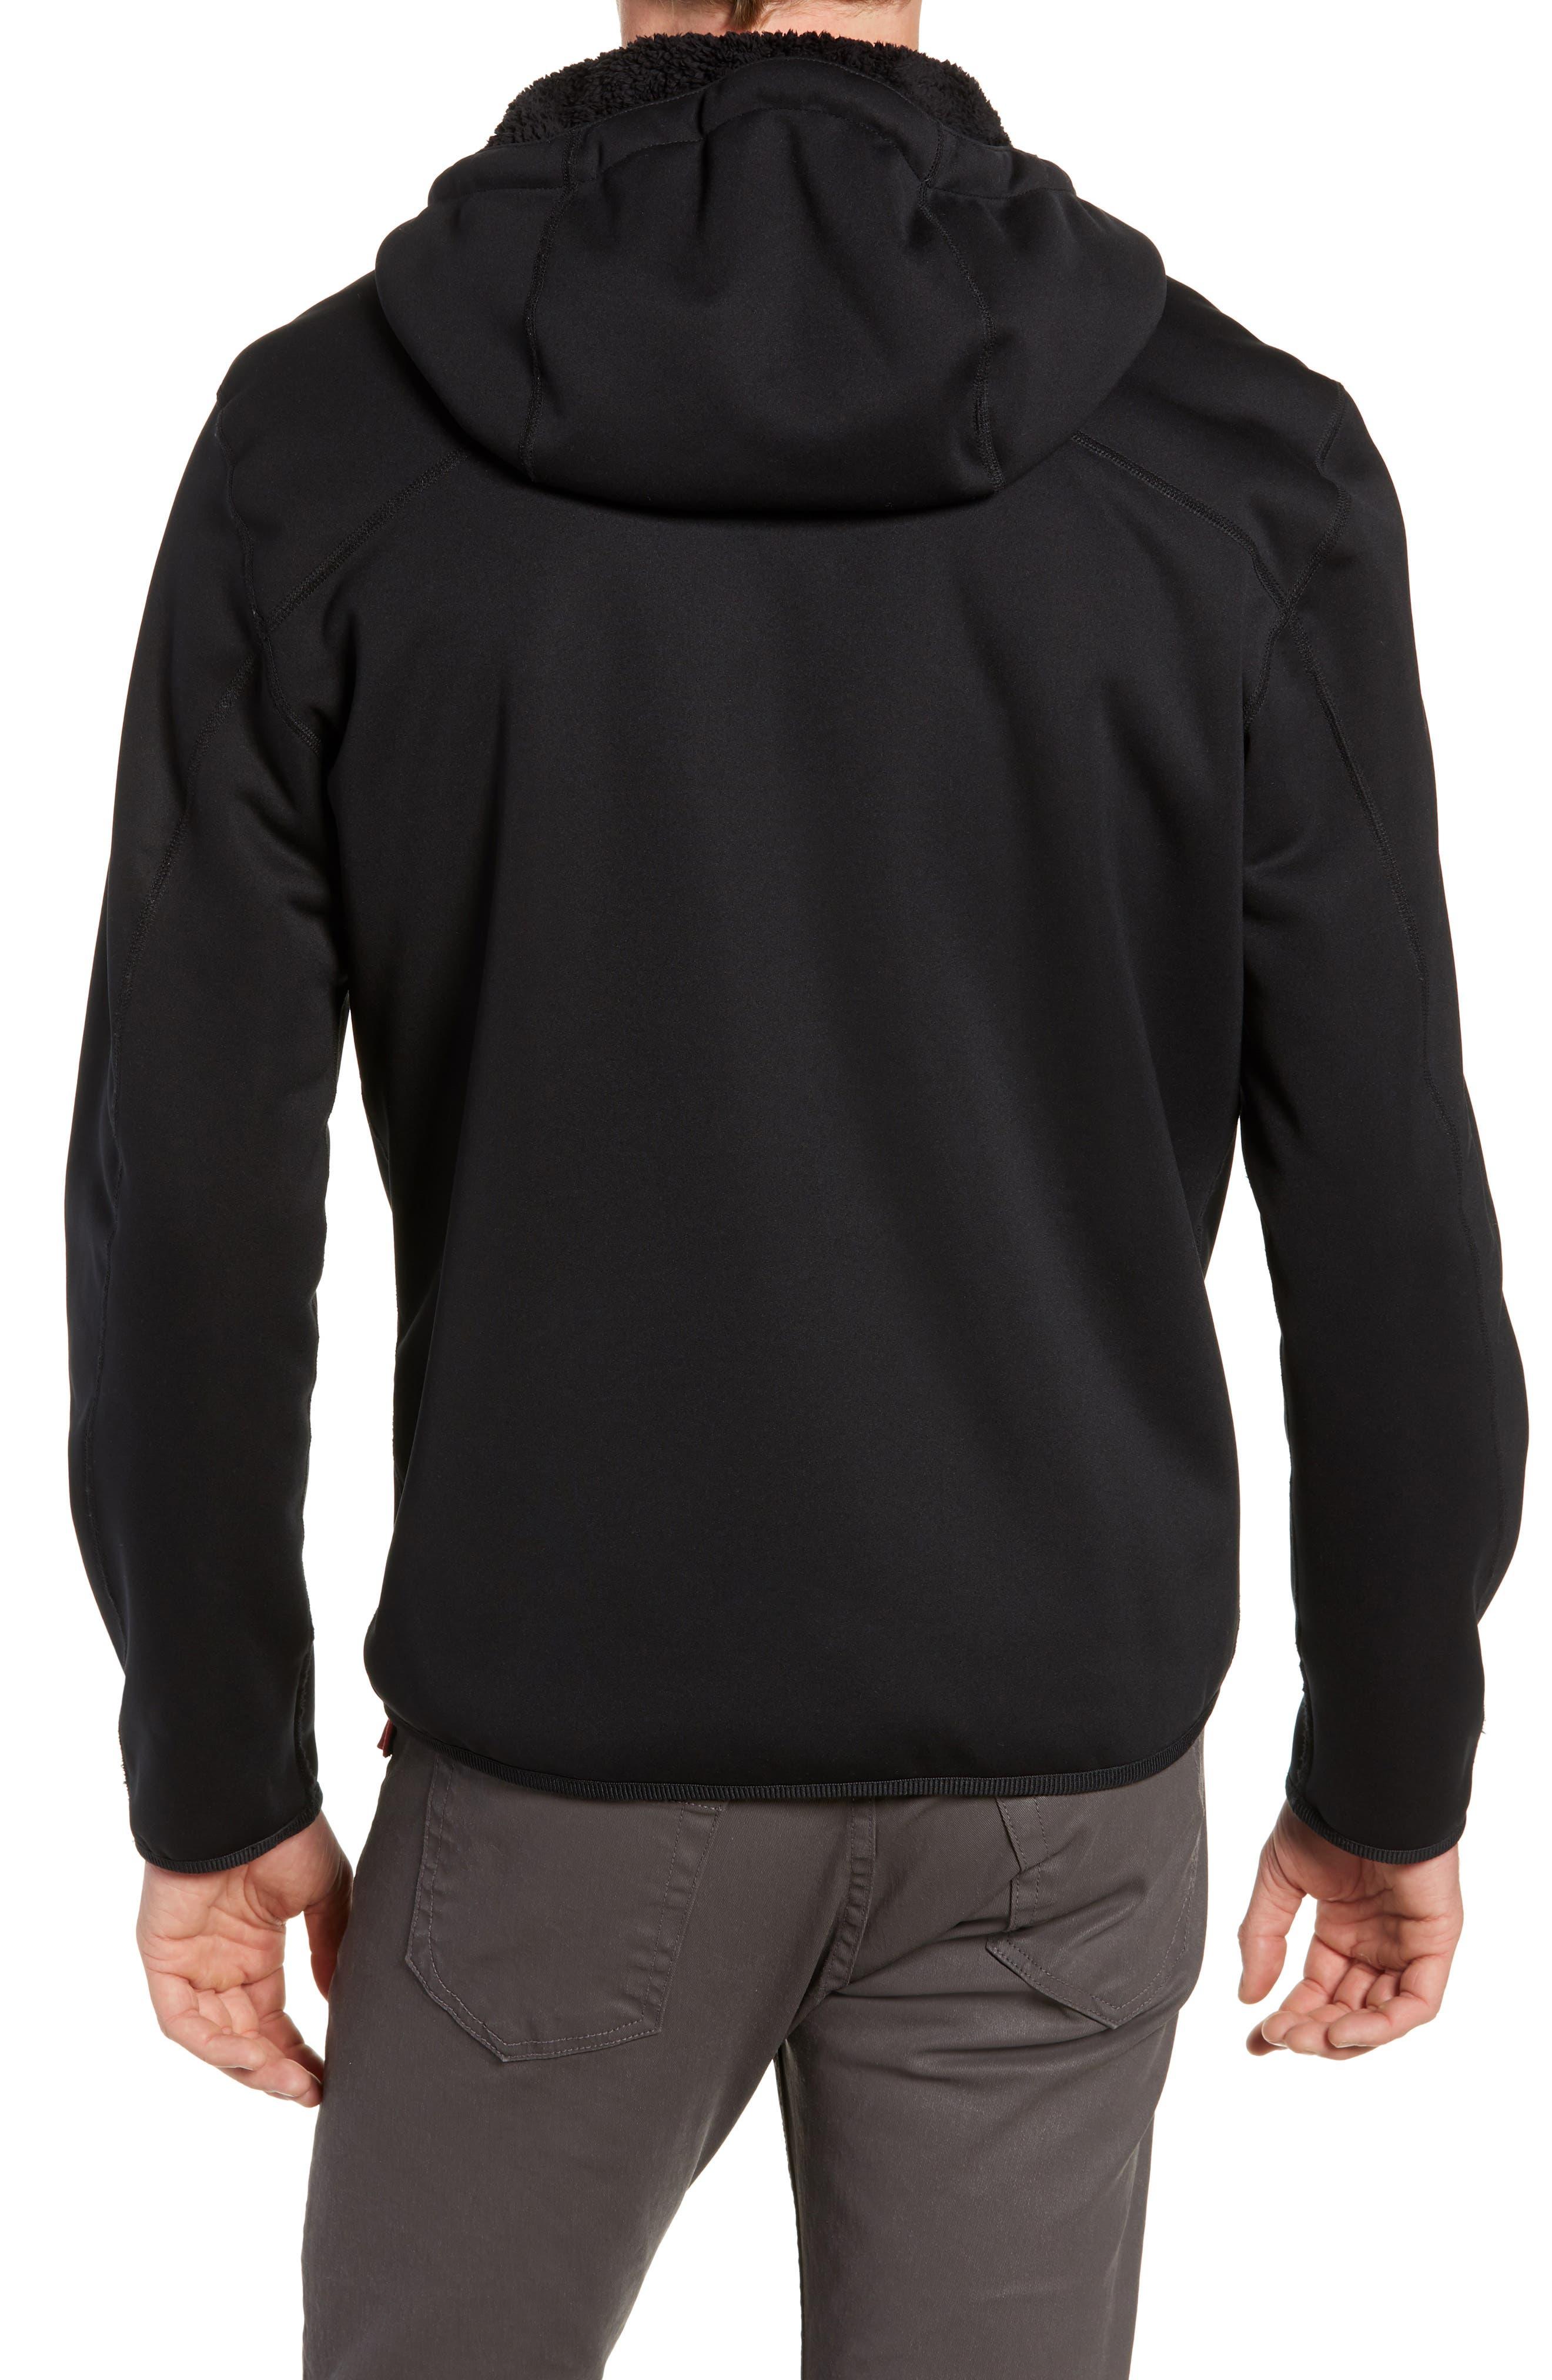 Tactic Hooded Fleece Jacket,                             Alternate thumbnail 2, color,                             BLACK